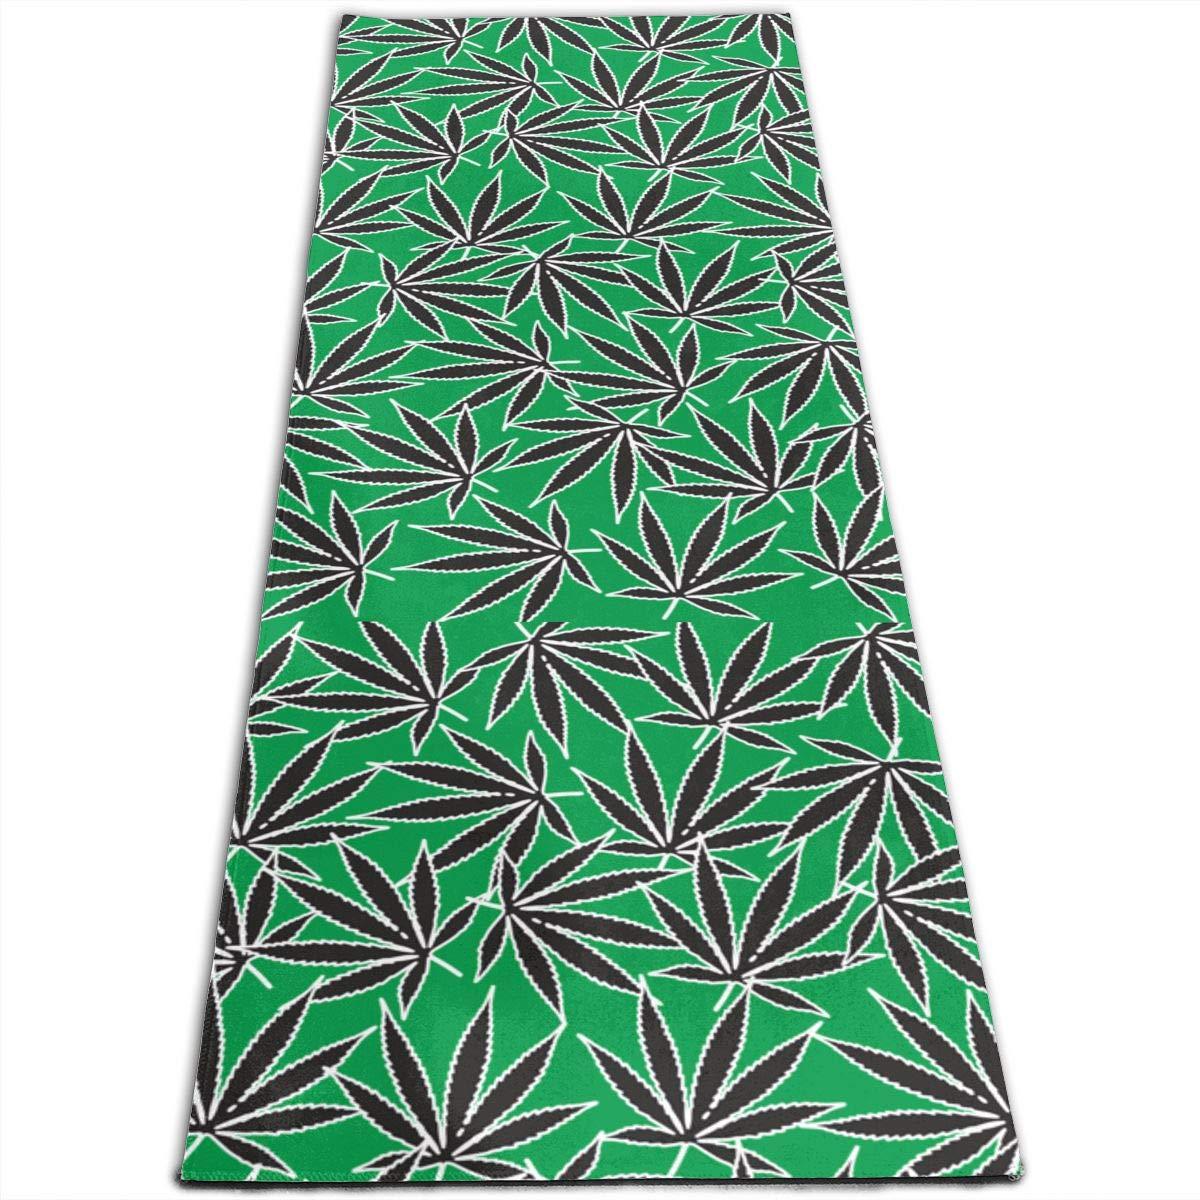 Amazon.com: Marijuana Cannabis Leaf Weed Pattern Printed ...